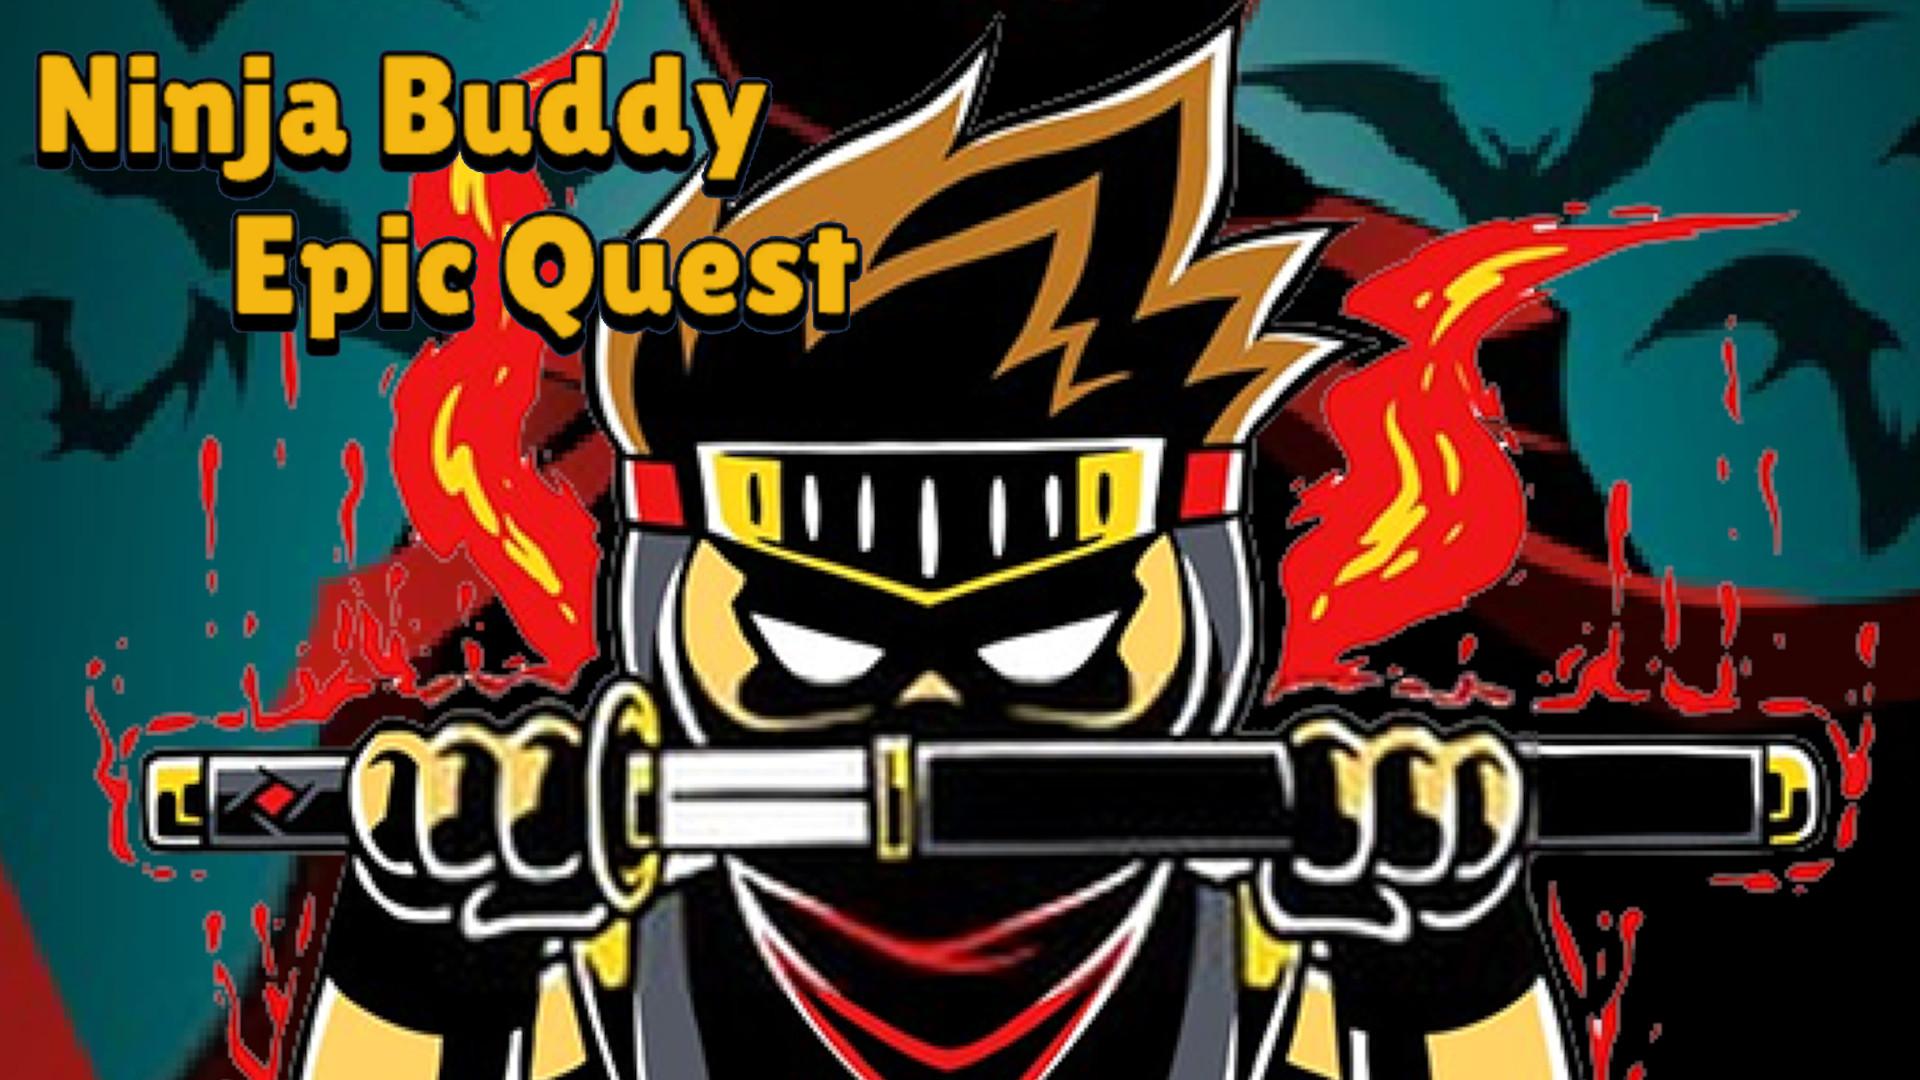 Ninja Buddy Epic Quest